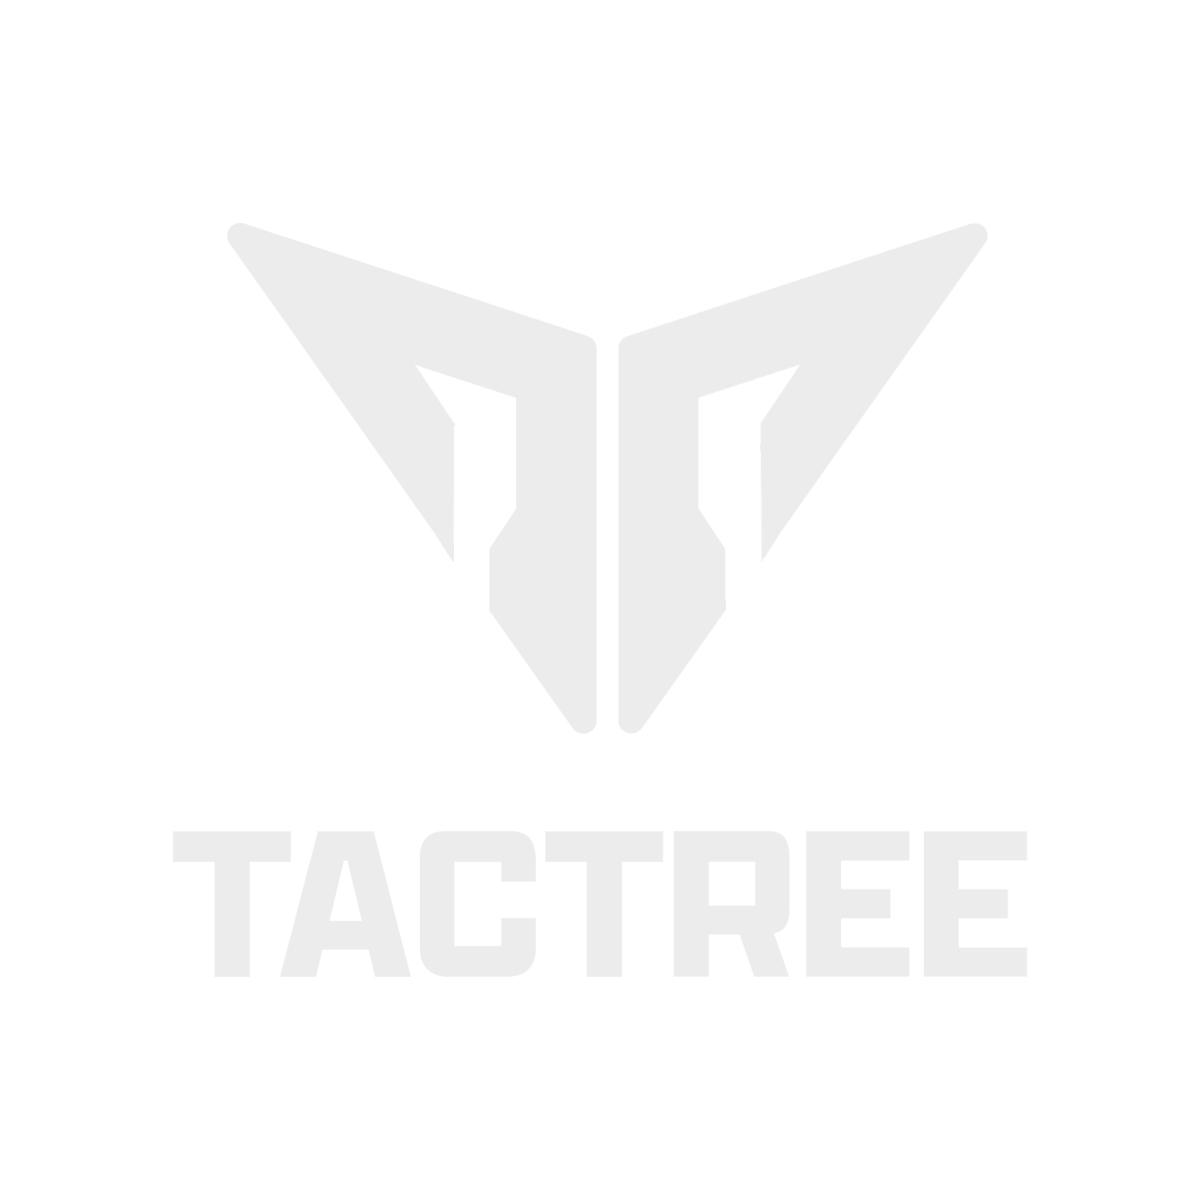 5.11 GEO7 Fast-Tac TDU Trousers (Terrain)